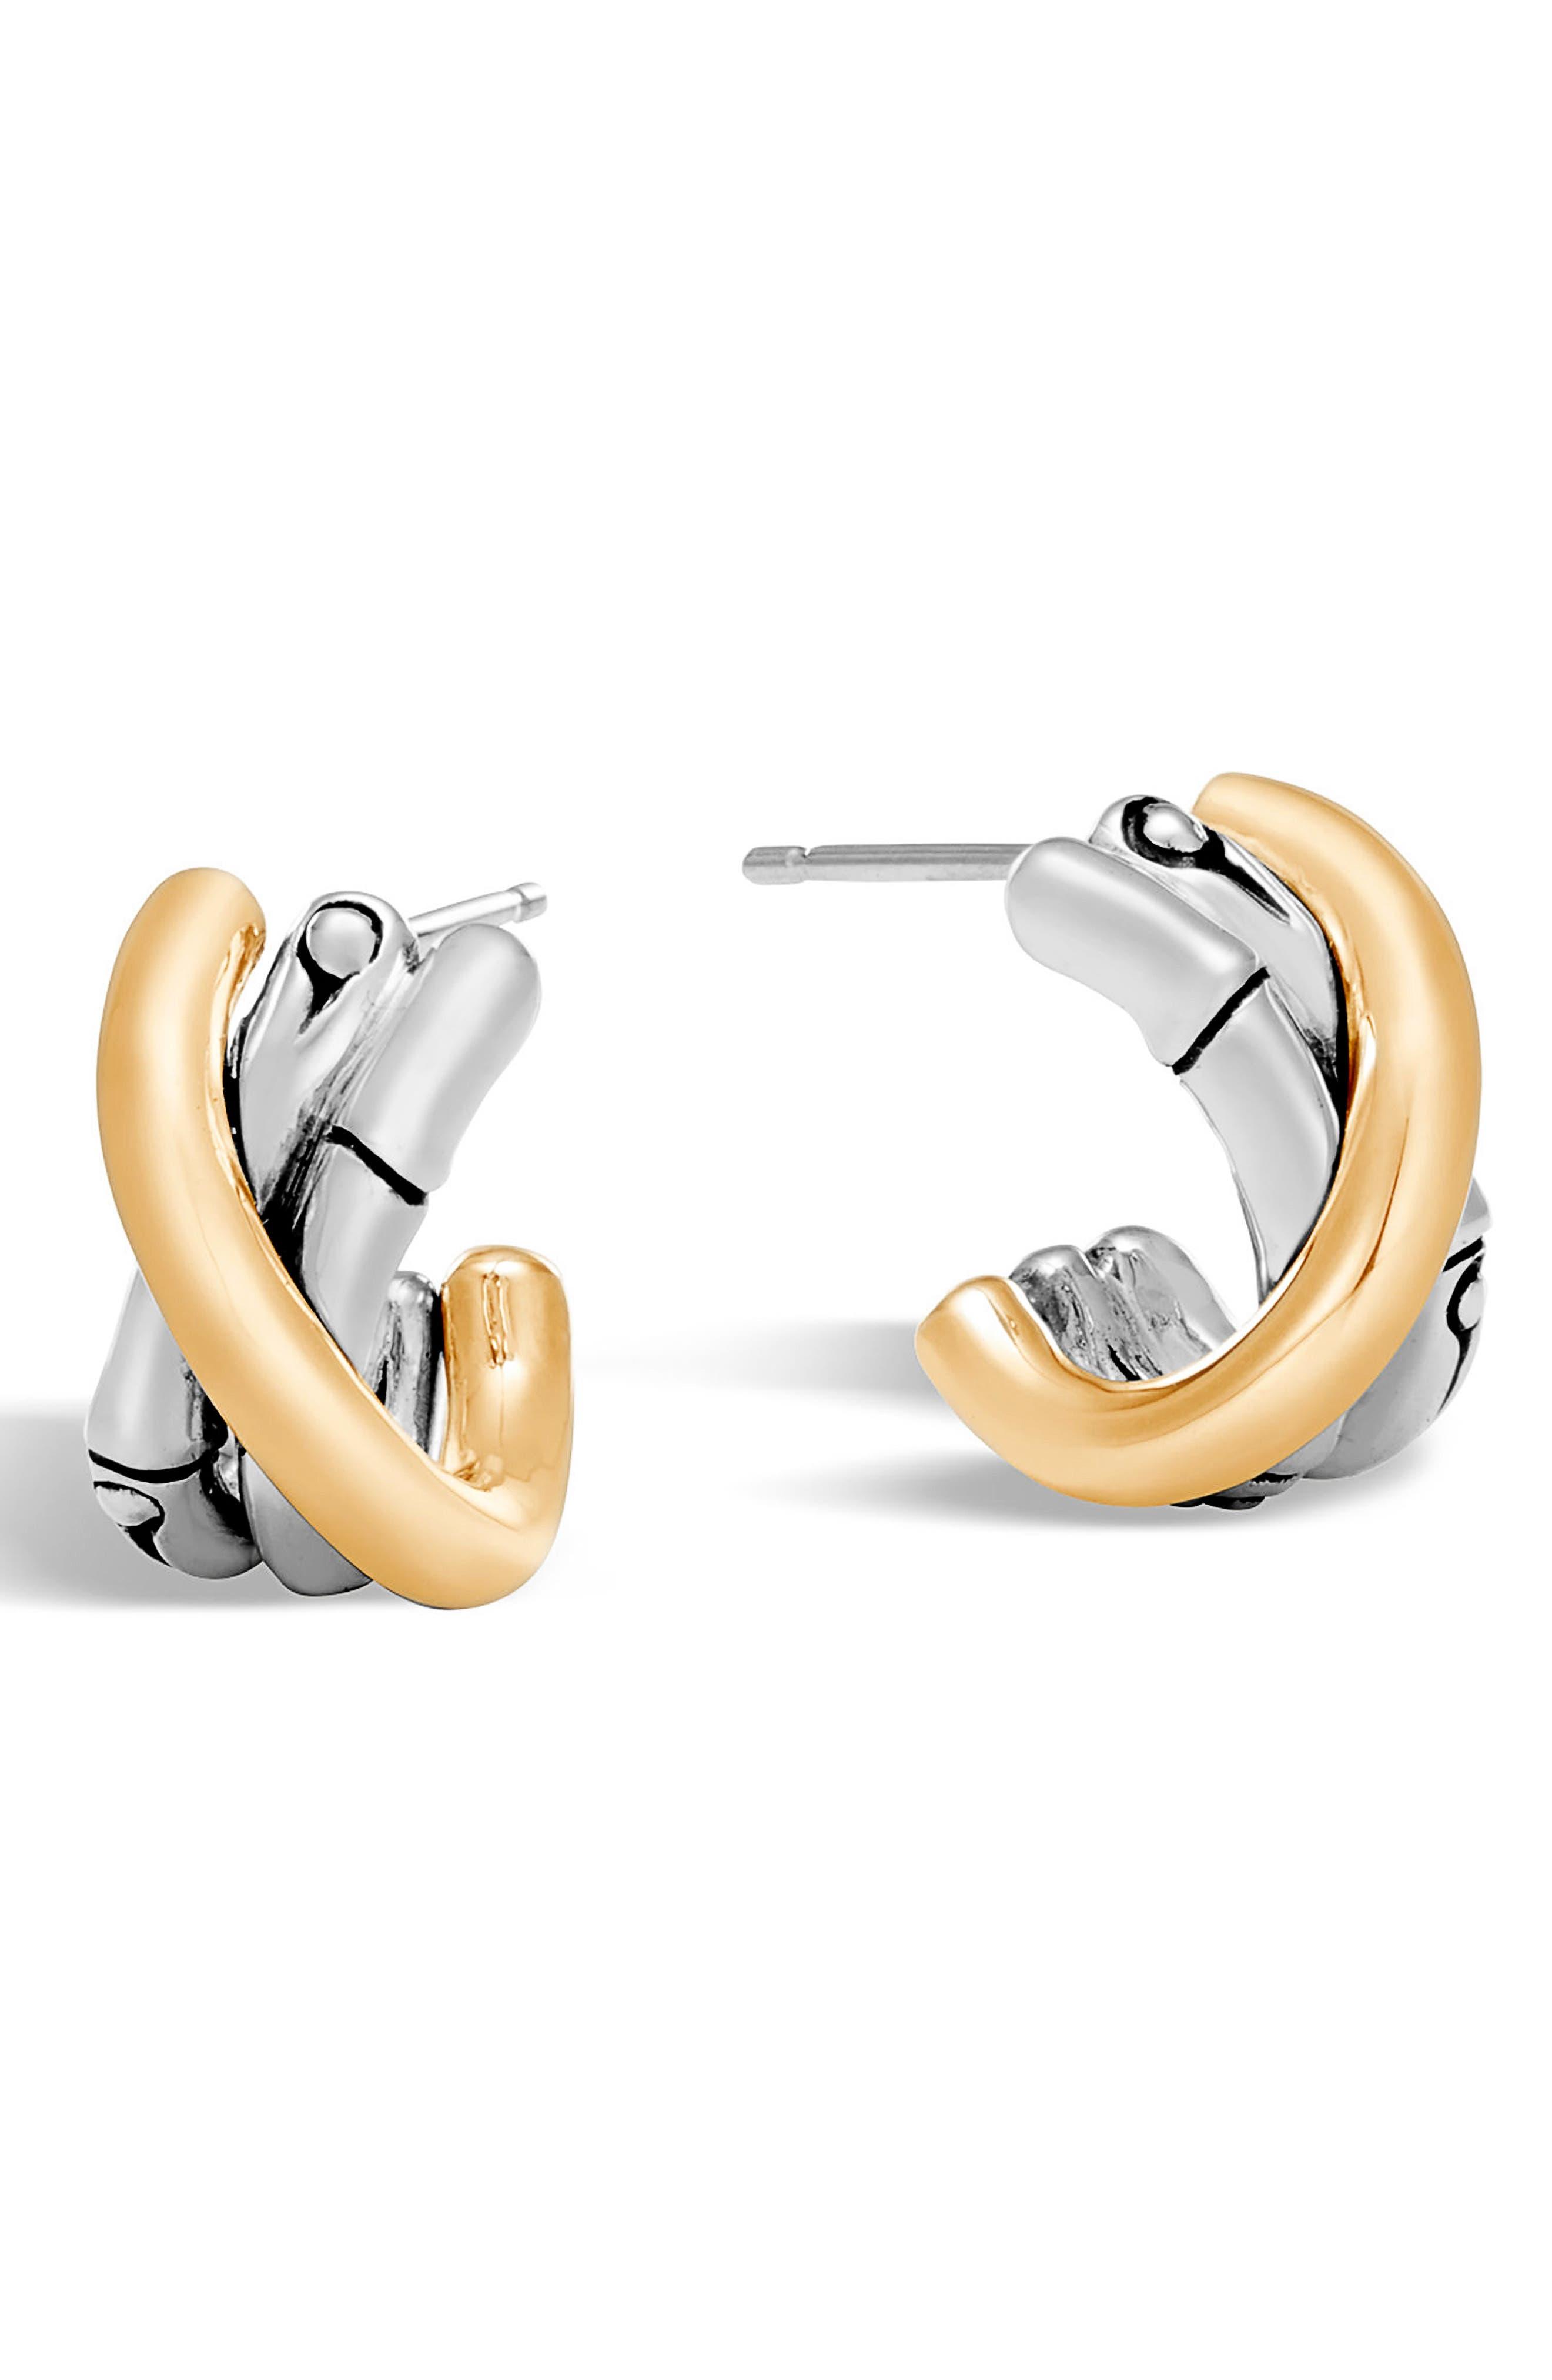 Main Image - John Hardy Bamboo Stud Earrings